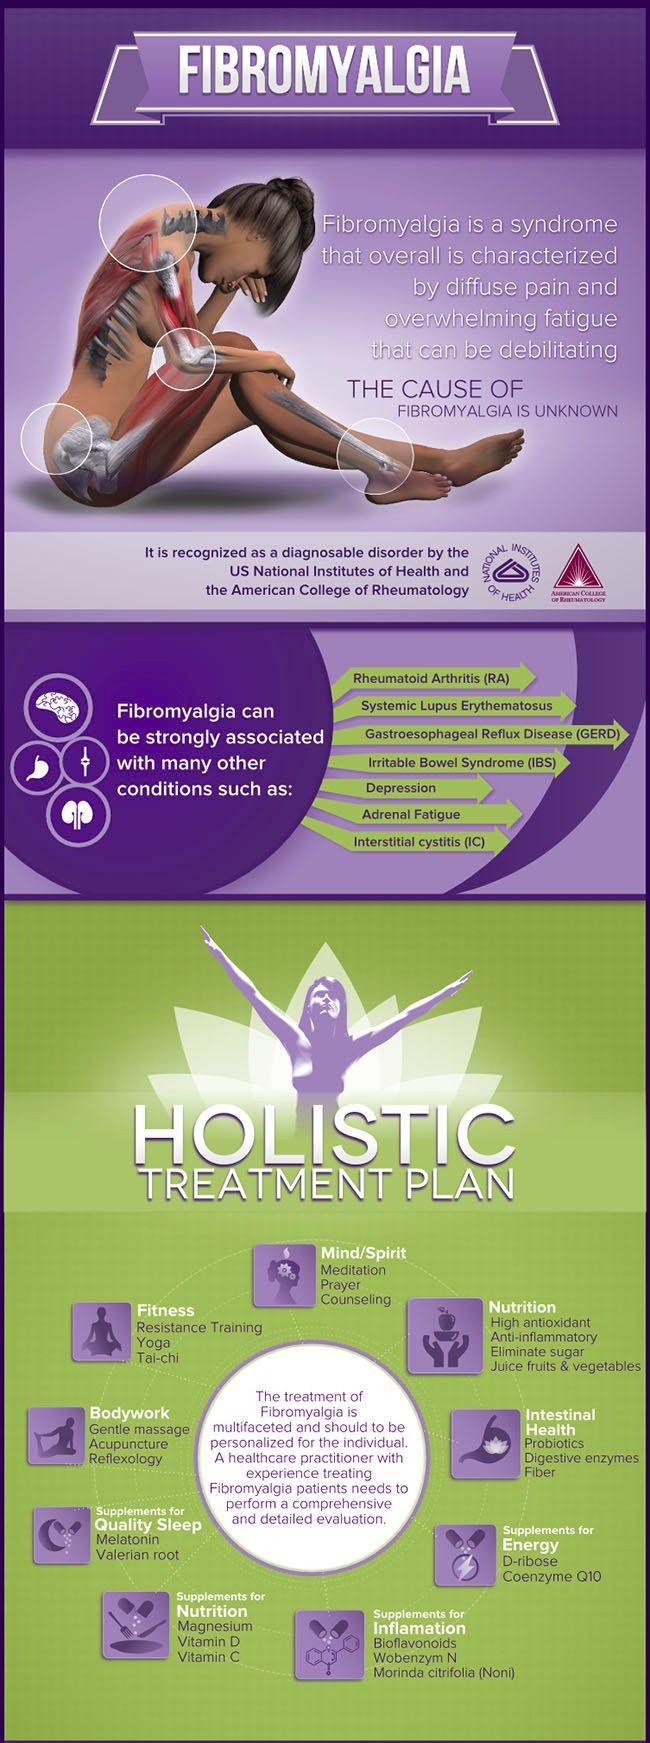 What is fibromyalgia